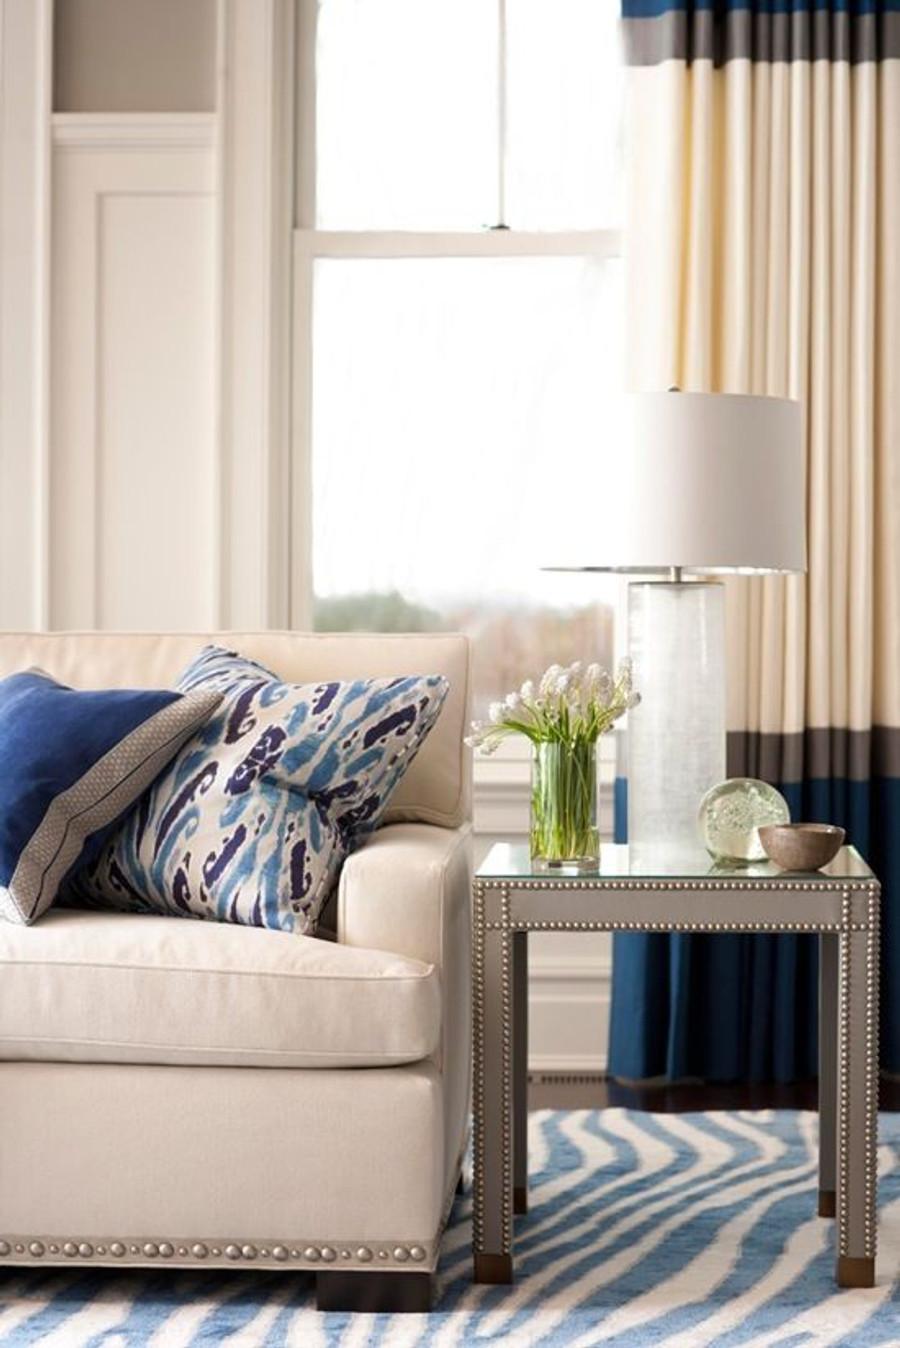 Beautiful Color Block Custom Pleated Drapes - Kravet Linen -Comes in Over 50 Beautiful Colors